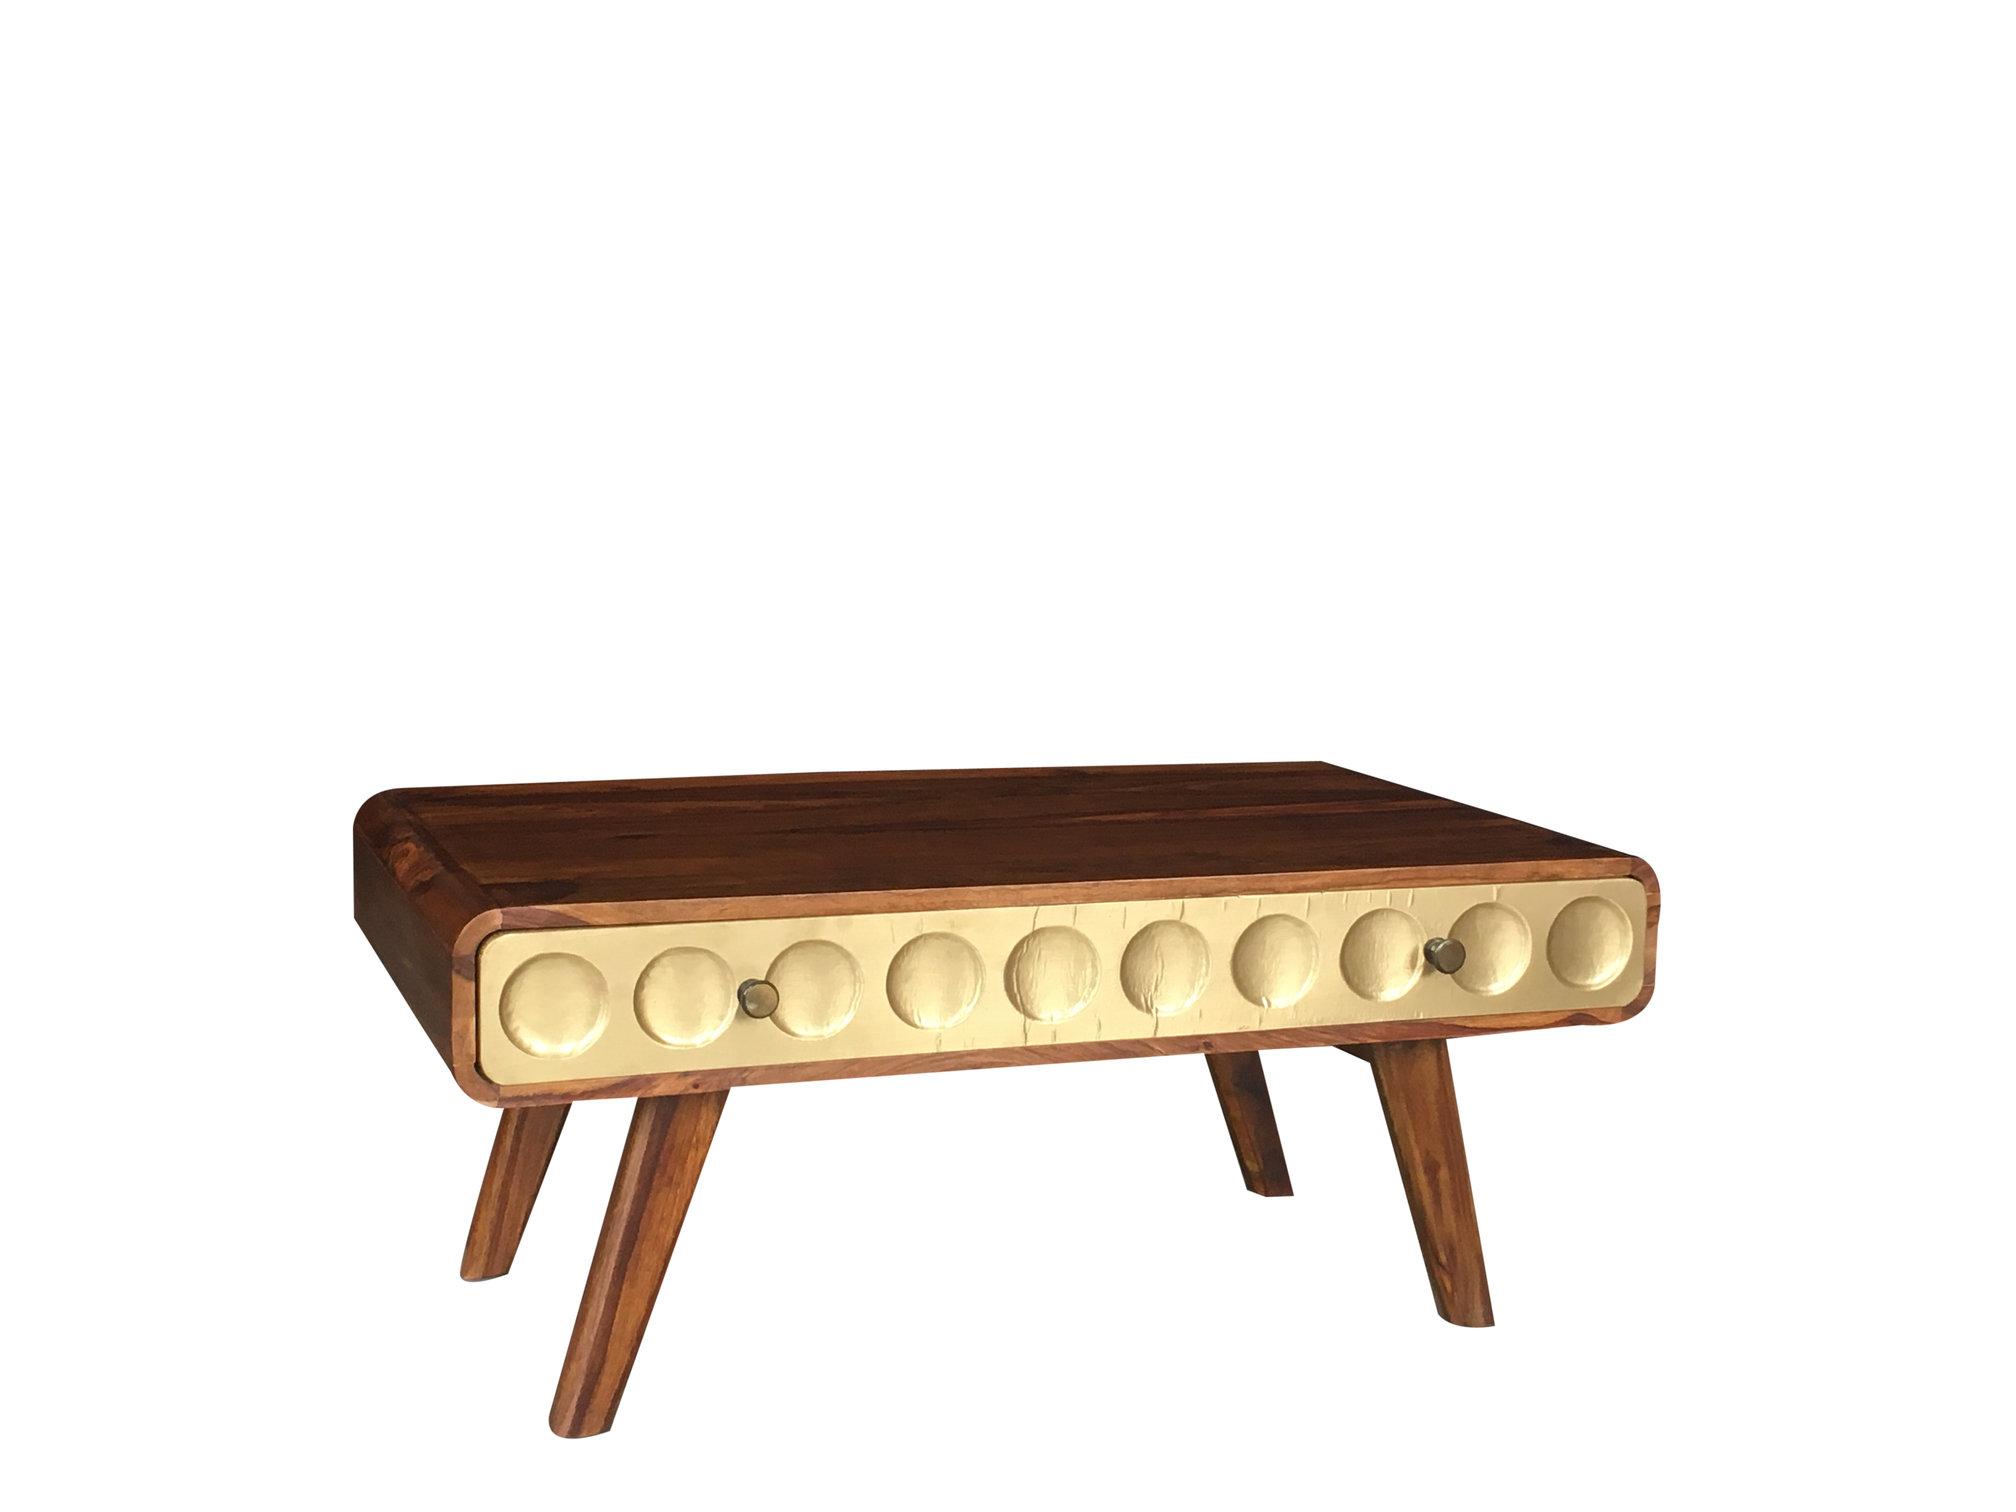 Swell Retro Style Sheesham Wood Coffee Table With Brass Effect Finish Drawer Evergreenethics Interior Chair Design Evergreenethicsorg